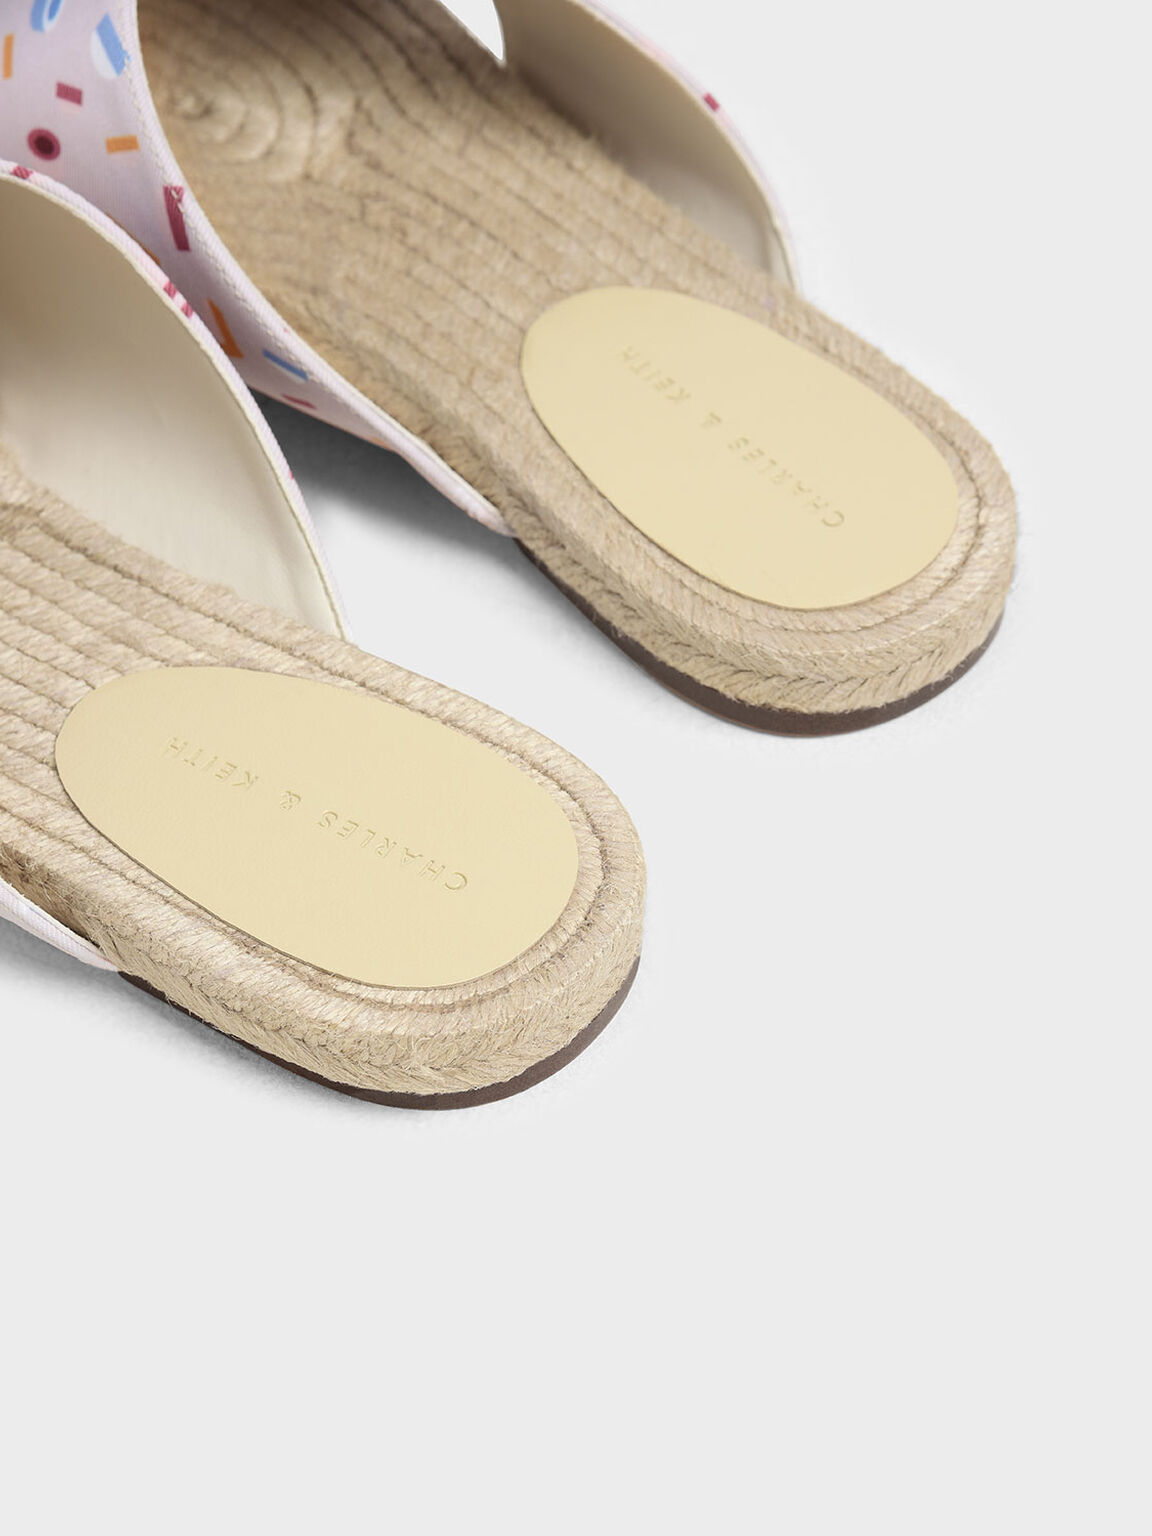 Criss Cross Printed Fabric Slide Sandals, Light Pink, hi-res